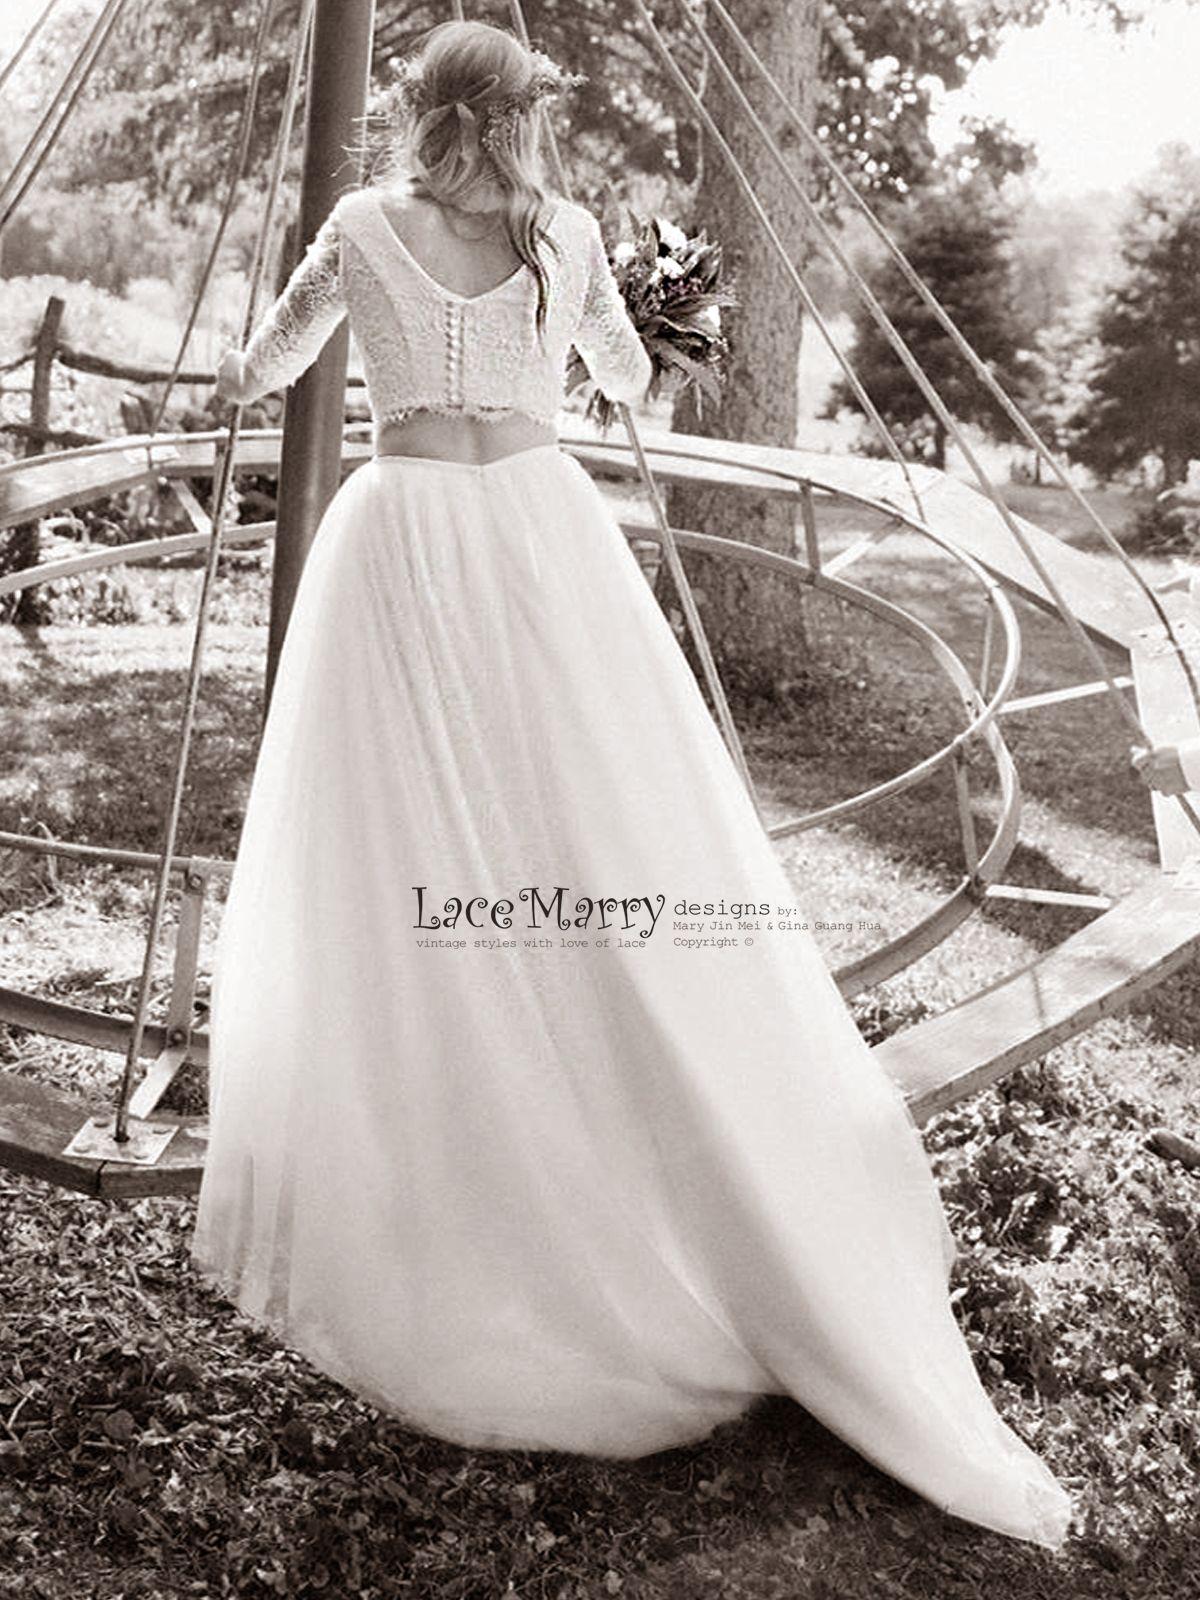 2 piece crop top wedding dress  Two Piece Wedding Dress Set  Lace Crop Top with Round Neckline and